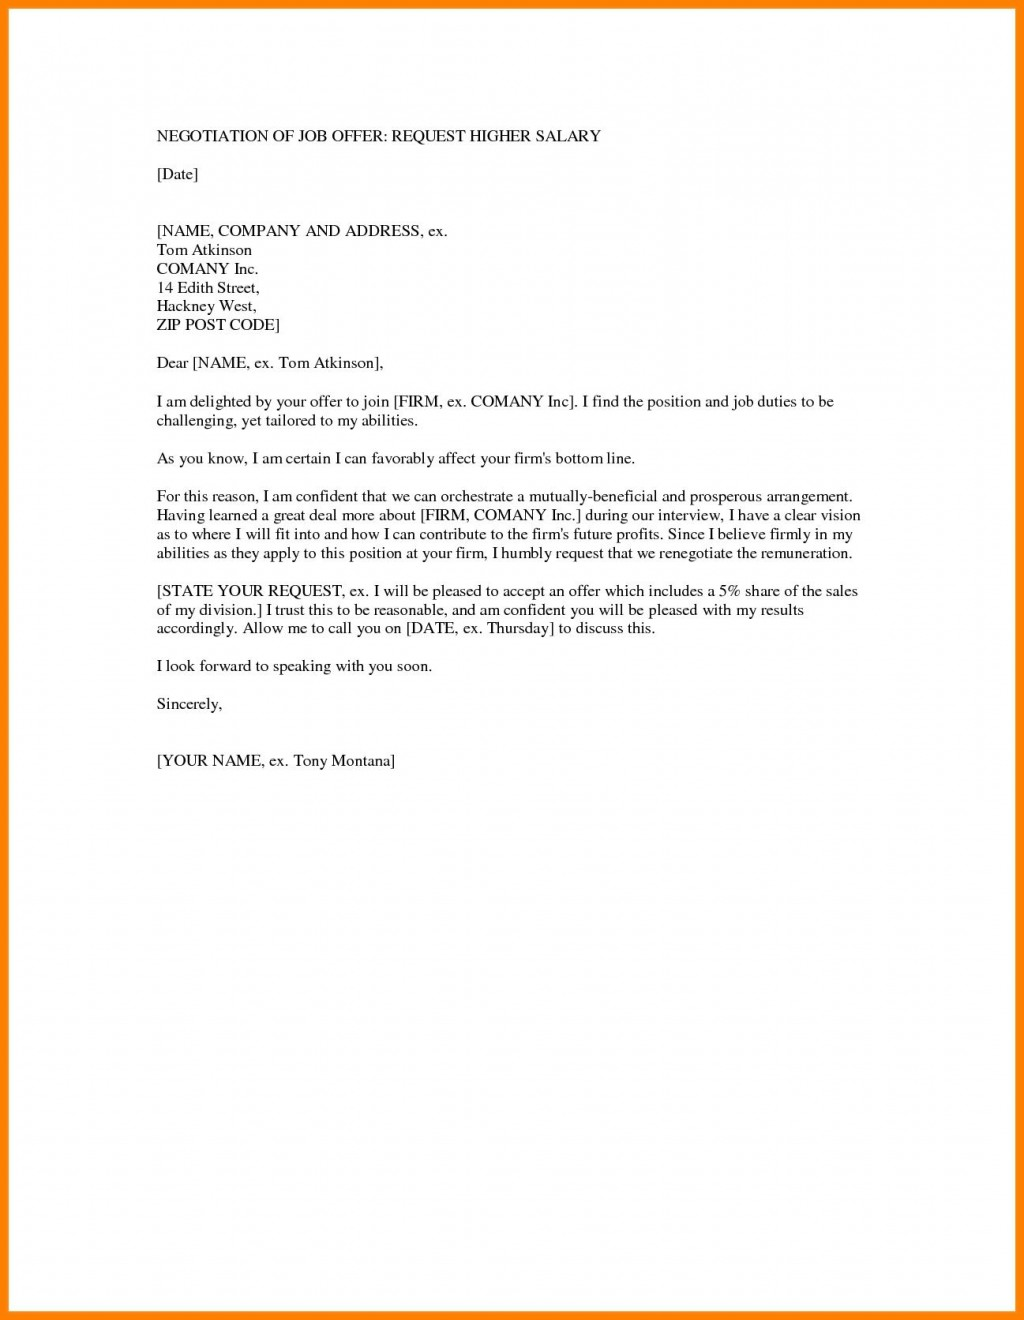 004 Dreaded Counter Offer Letter Template High Definition  Real Estate Settlement DebtLarge